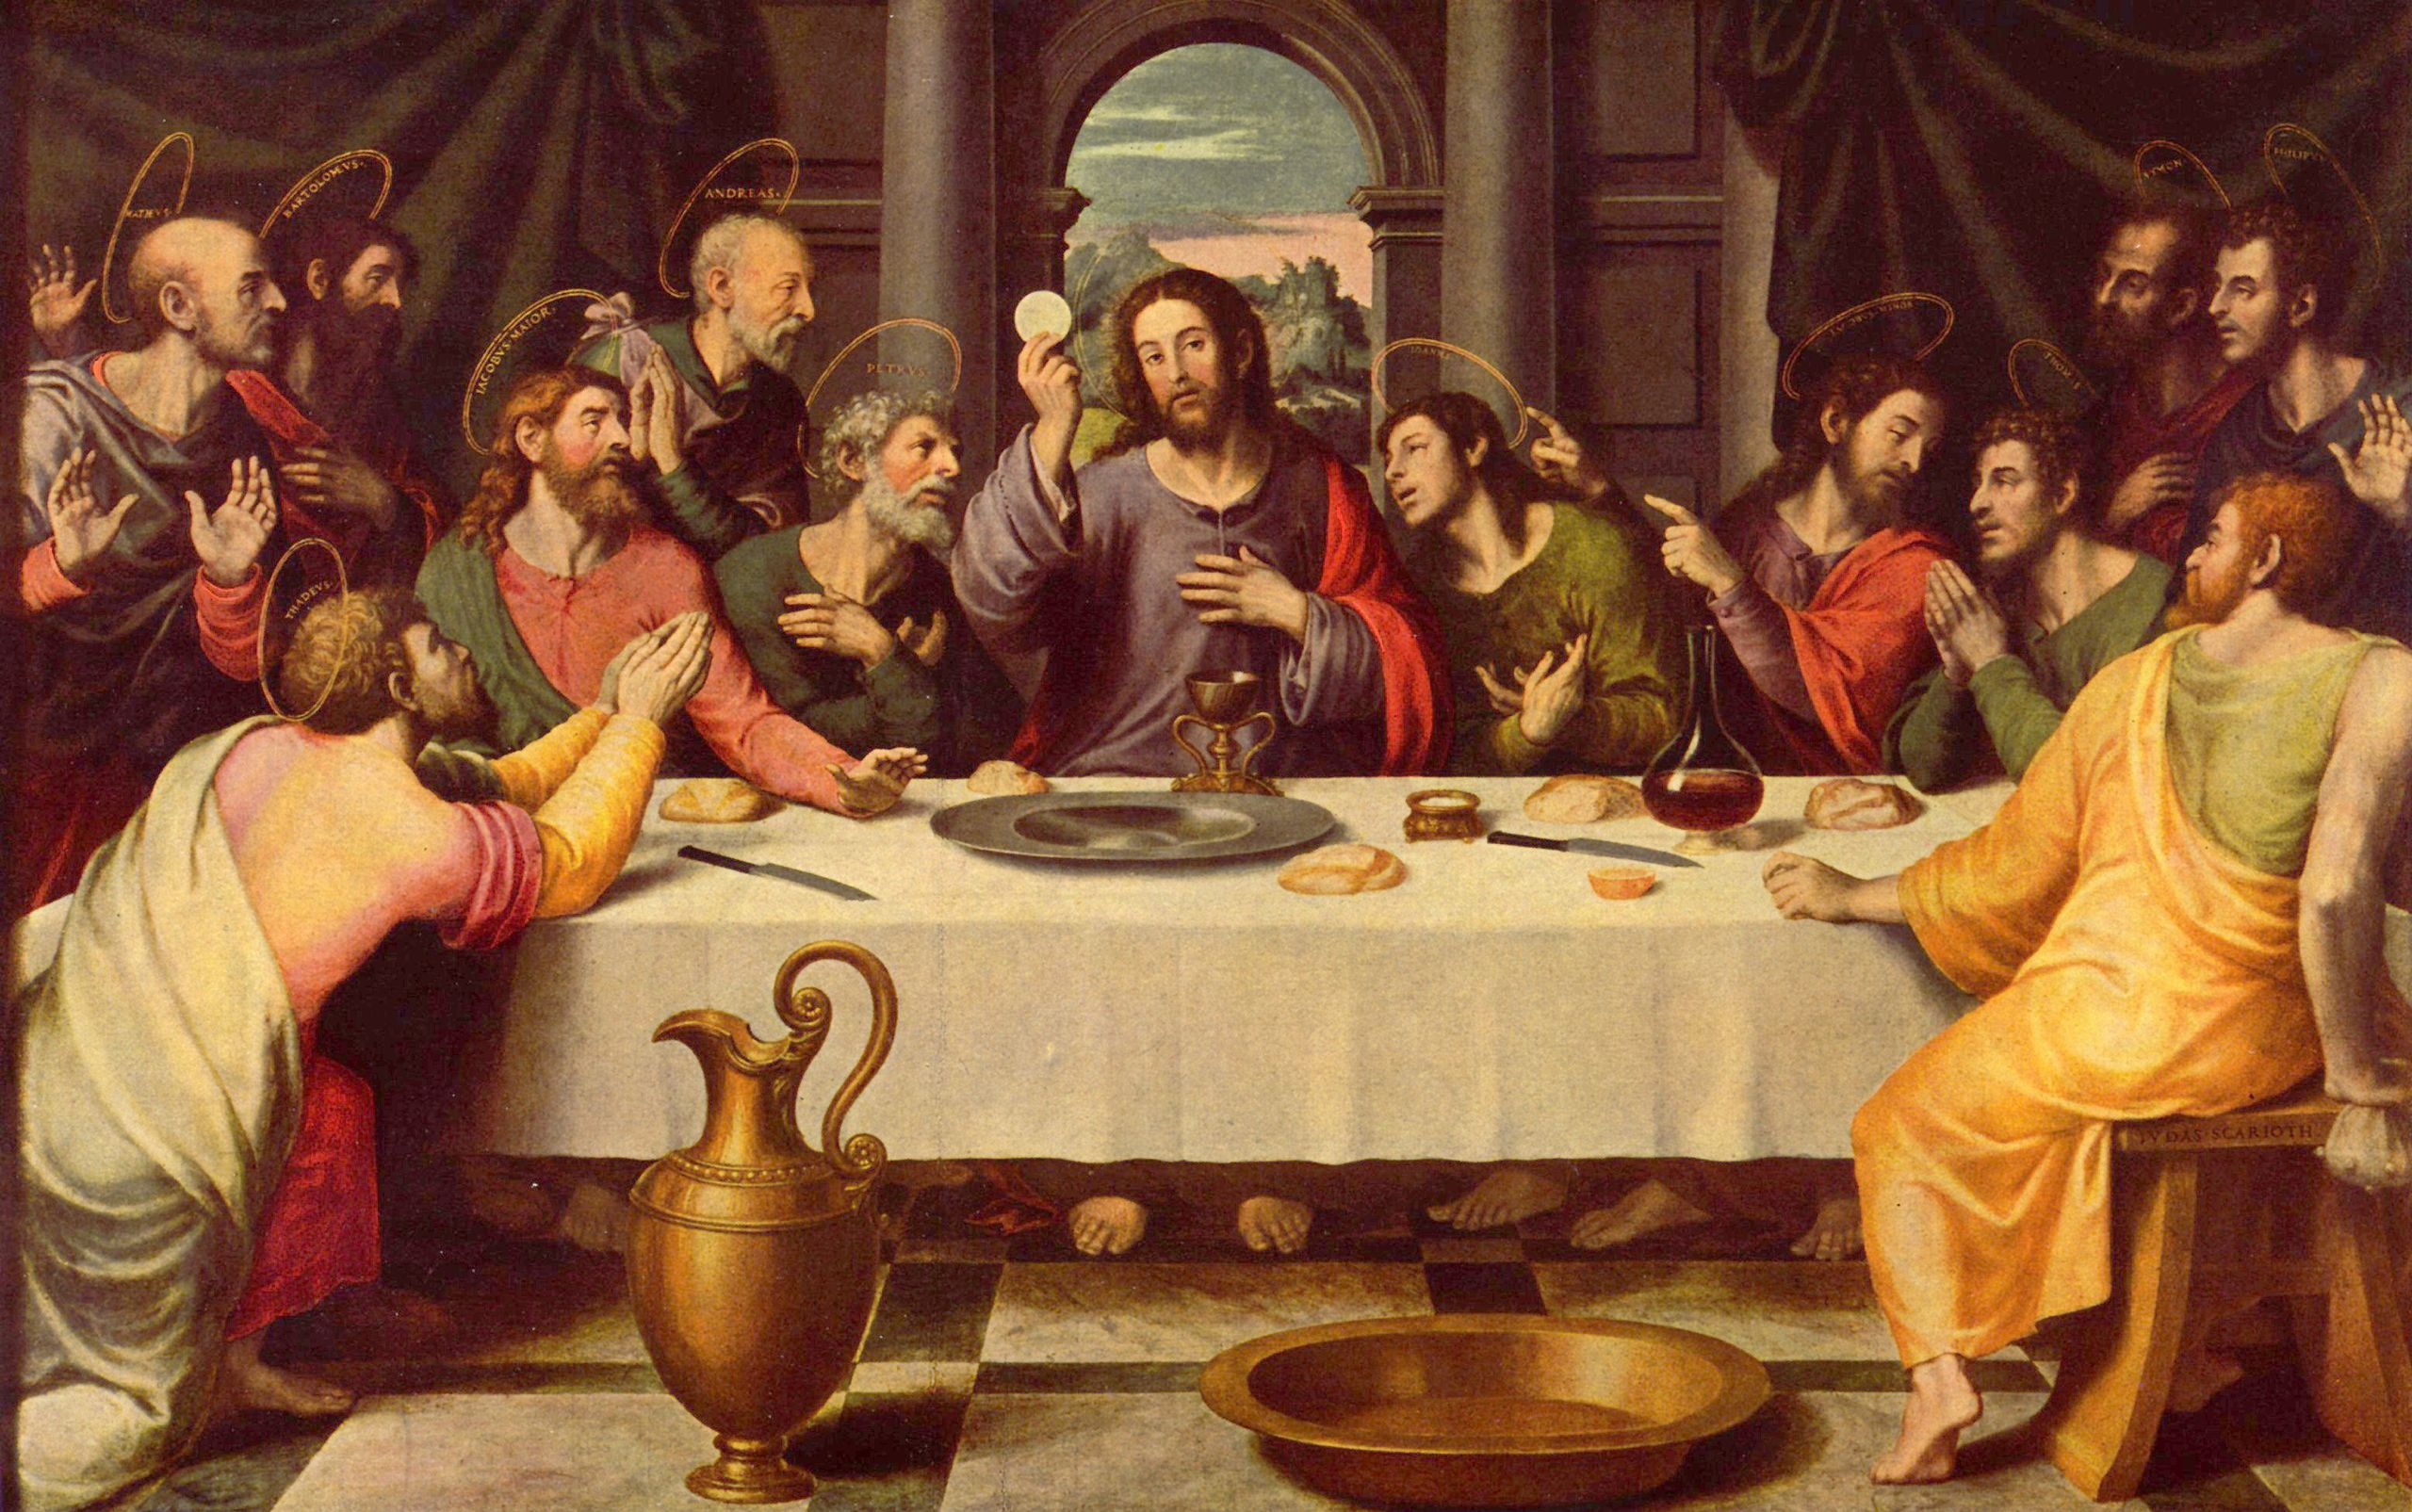 Großbild: juan de juanes: das abendmahl